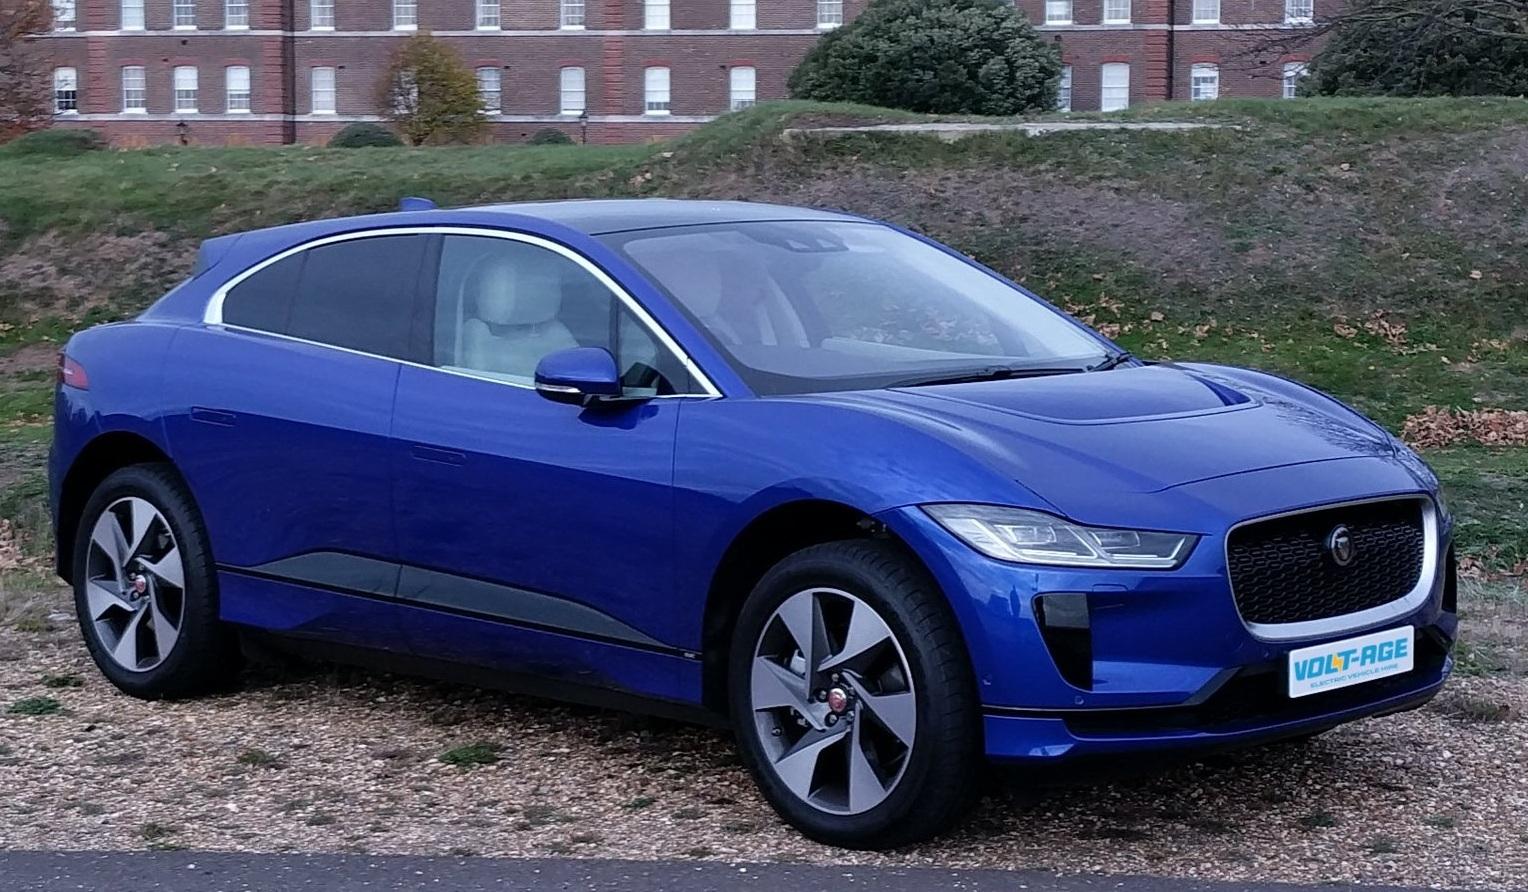 We've reviewed the Jaguar I-Pace -